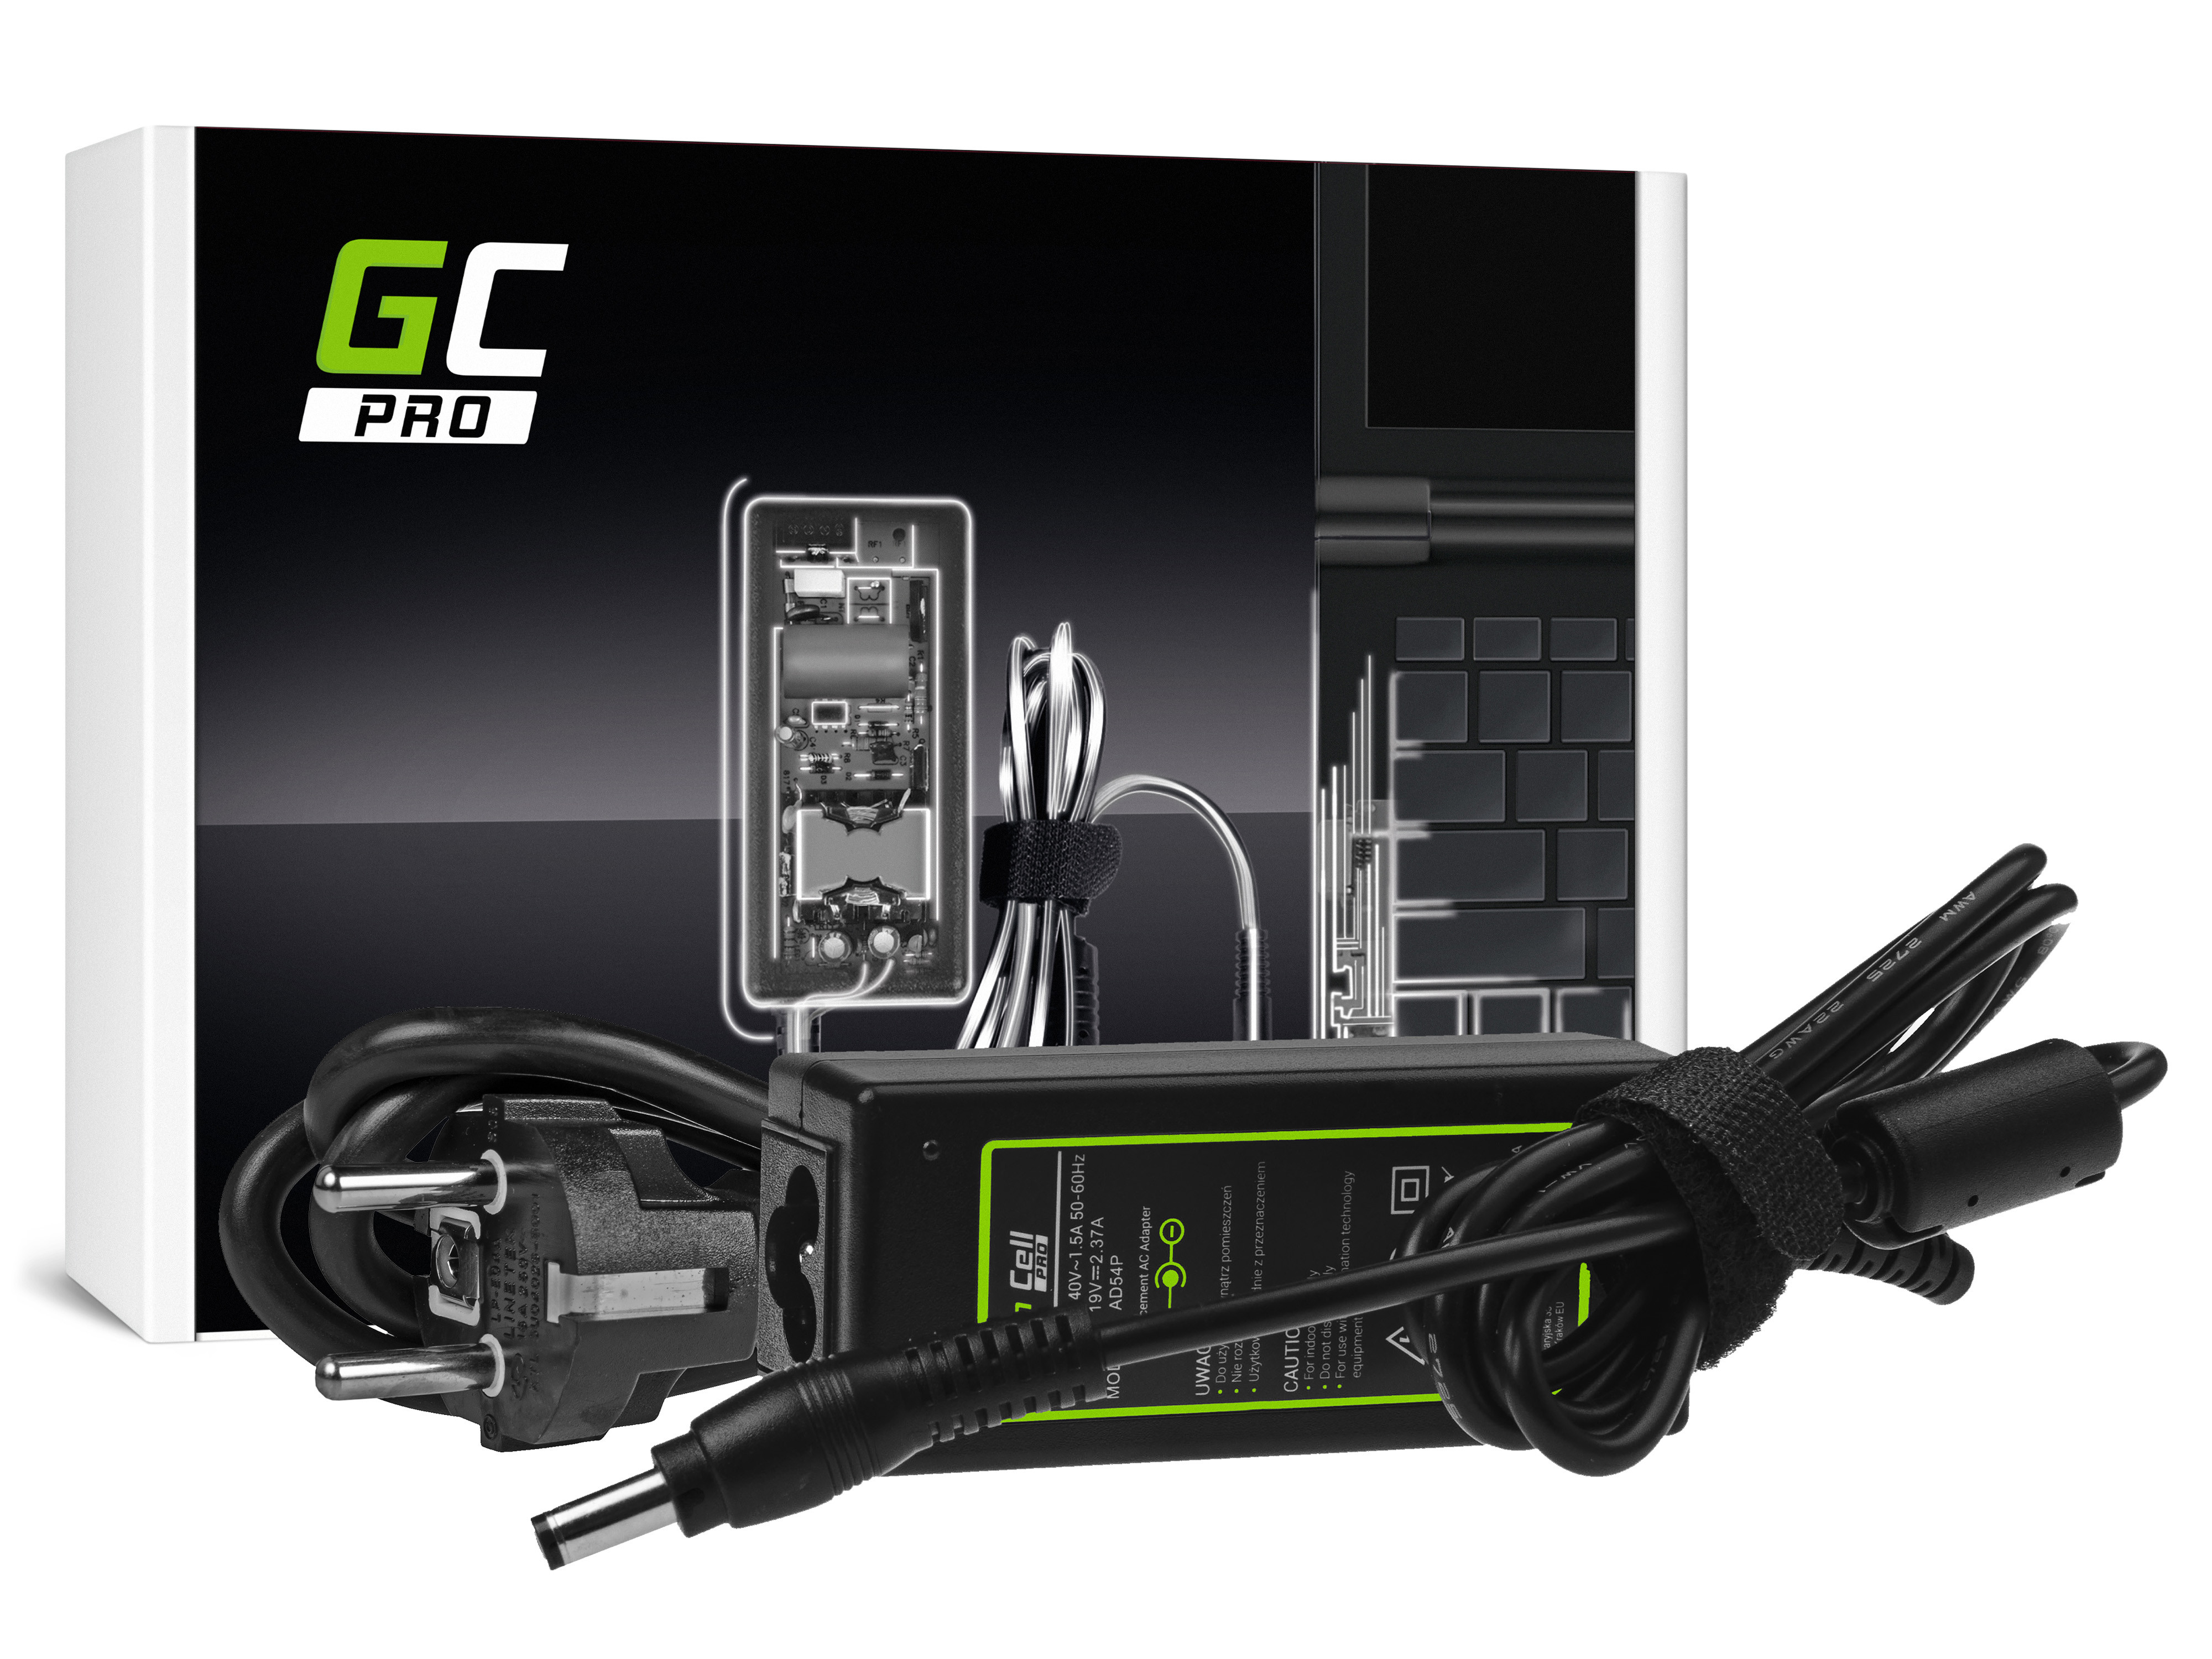 Green Cell AD54P Adaptér Nabíječka Toshiba Satellite C50D C75D C670D C870D U940 U945 Portege Z830 Z930 19V 2.37A 45W